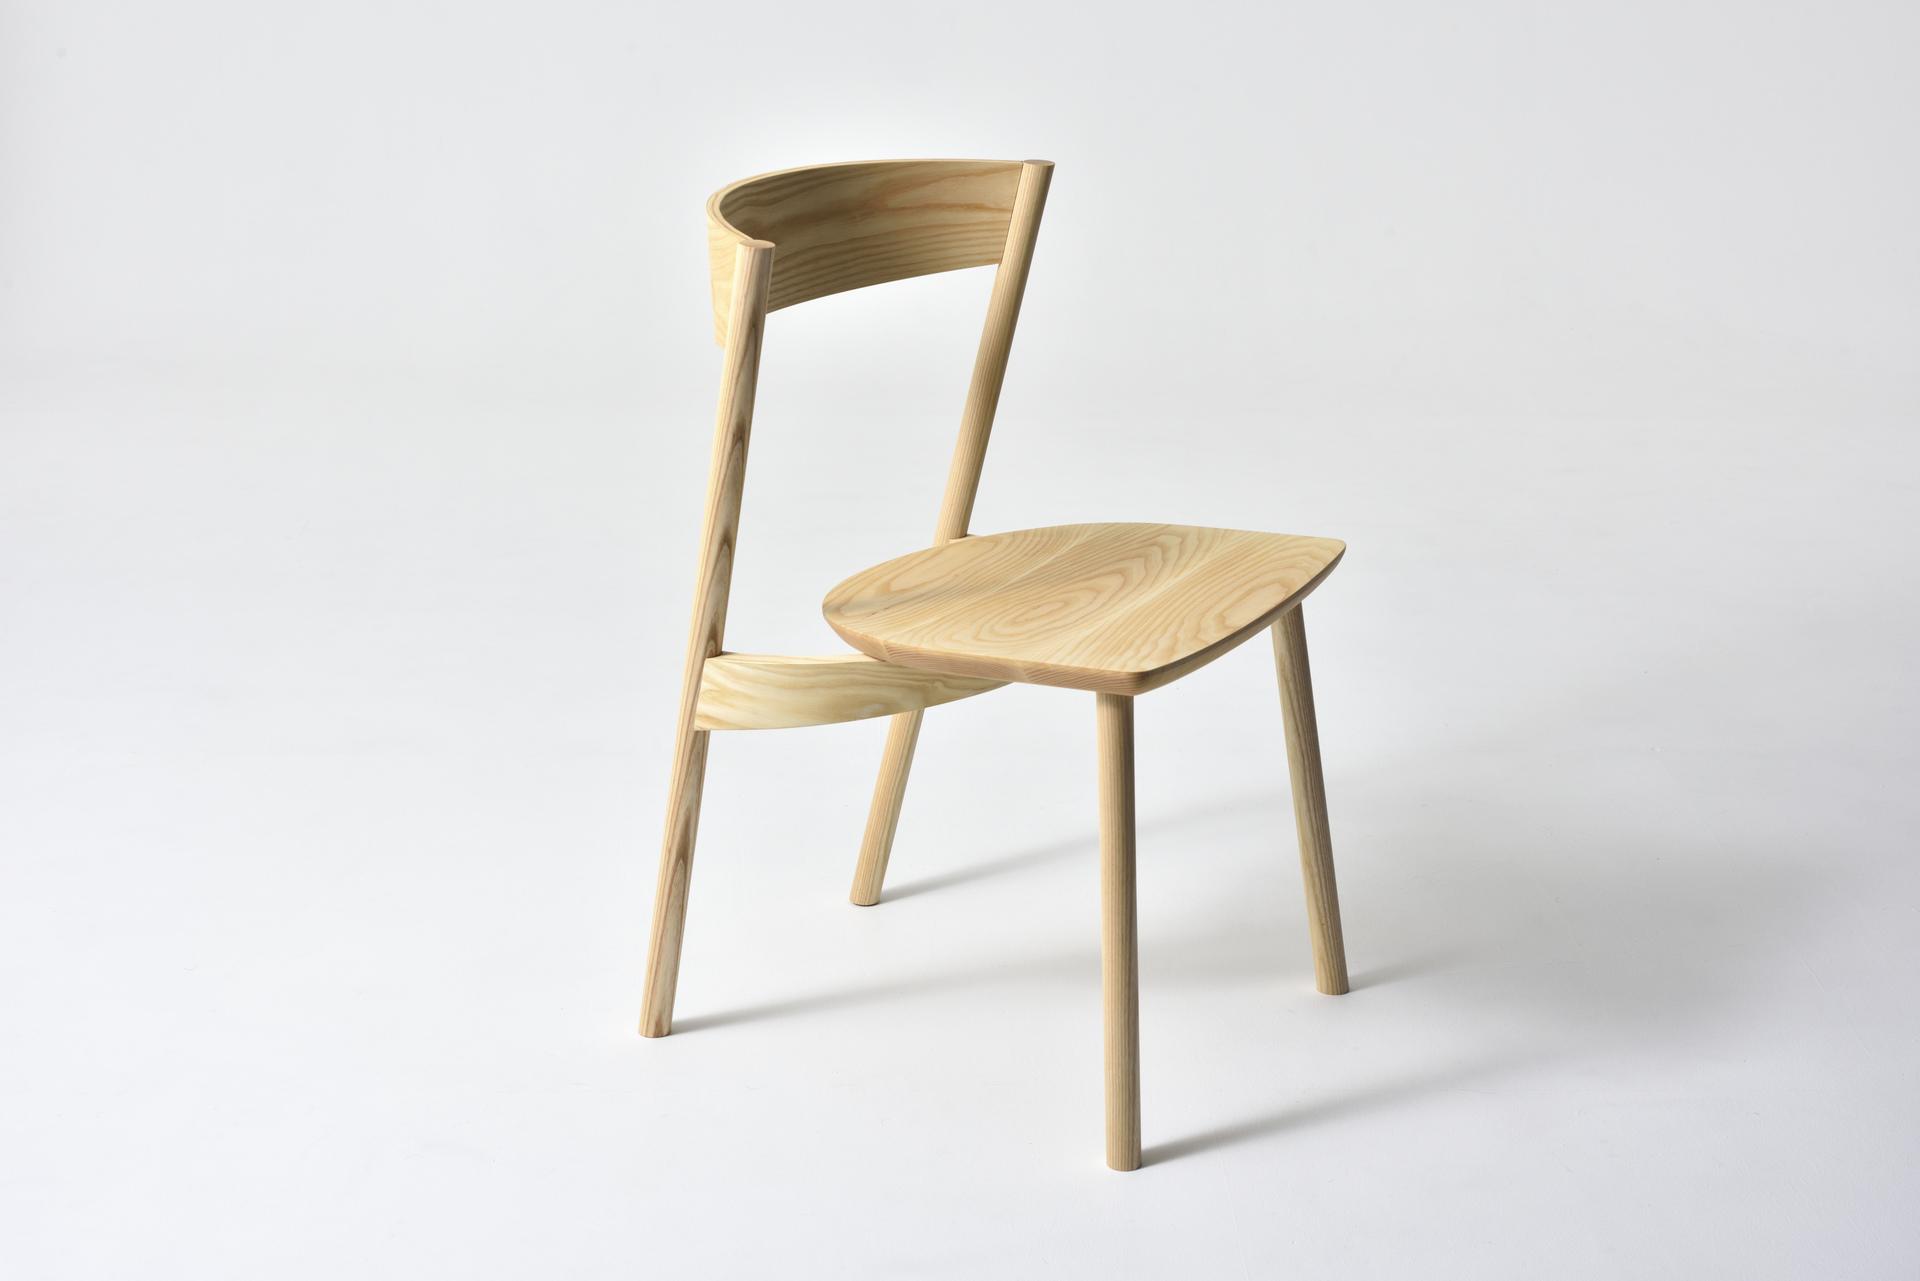 u-chair-shinya-oguchi-01